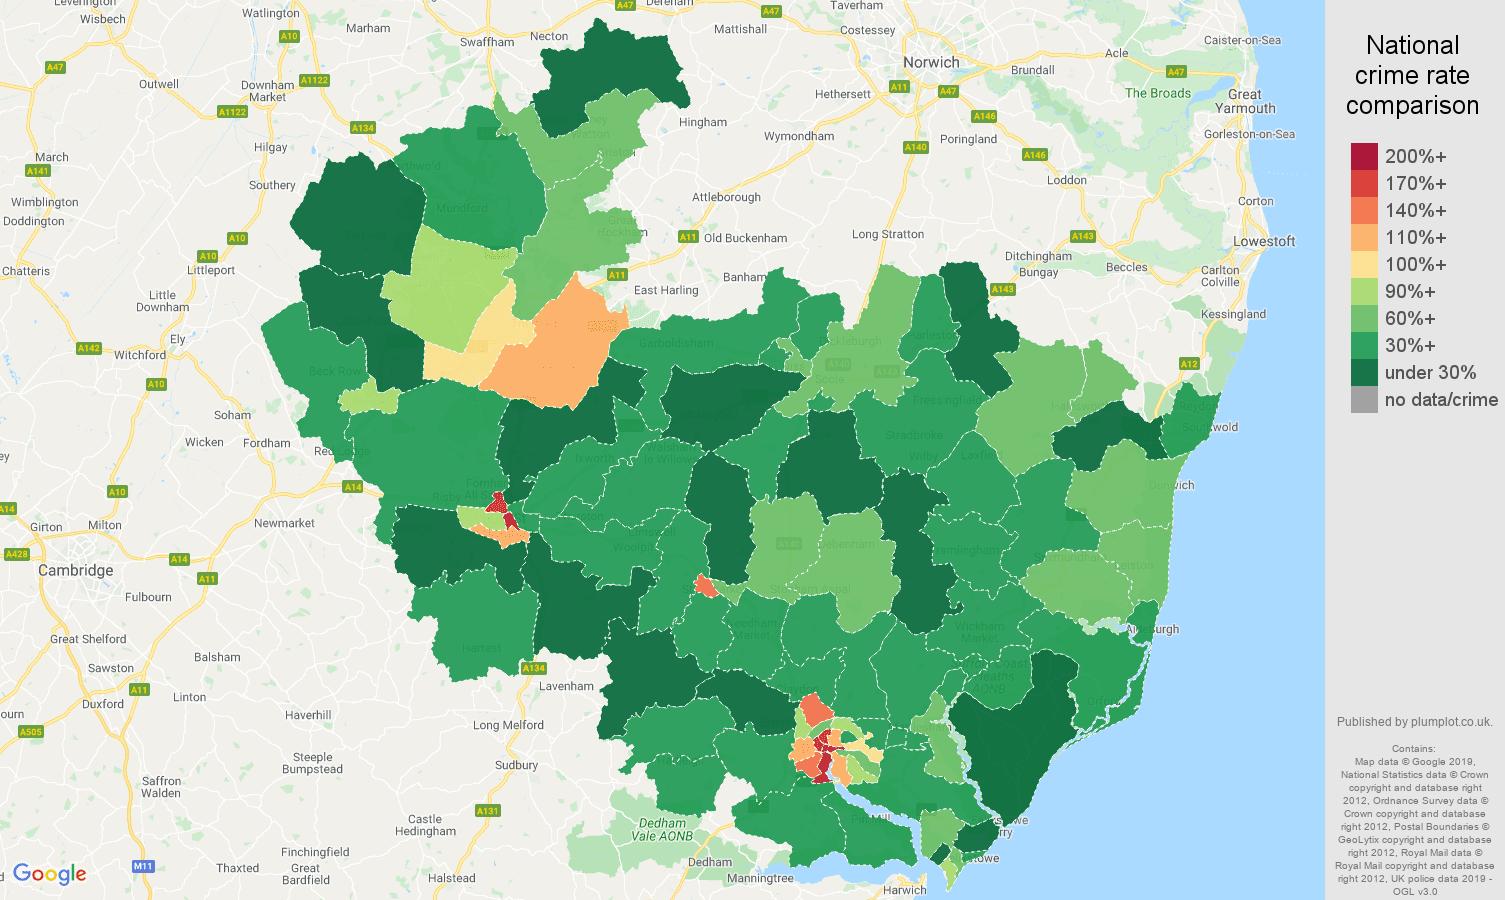 Ipswich public order crime rate comparison map